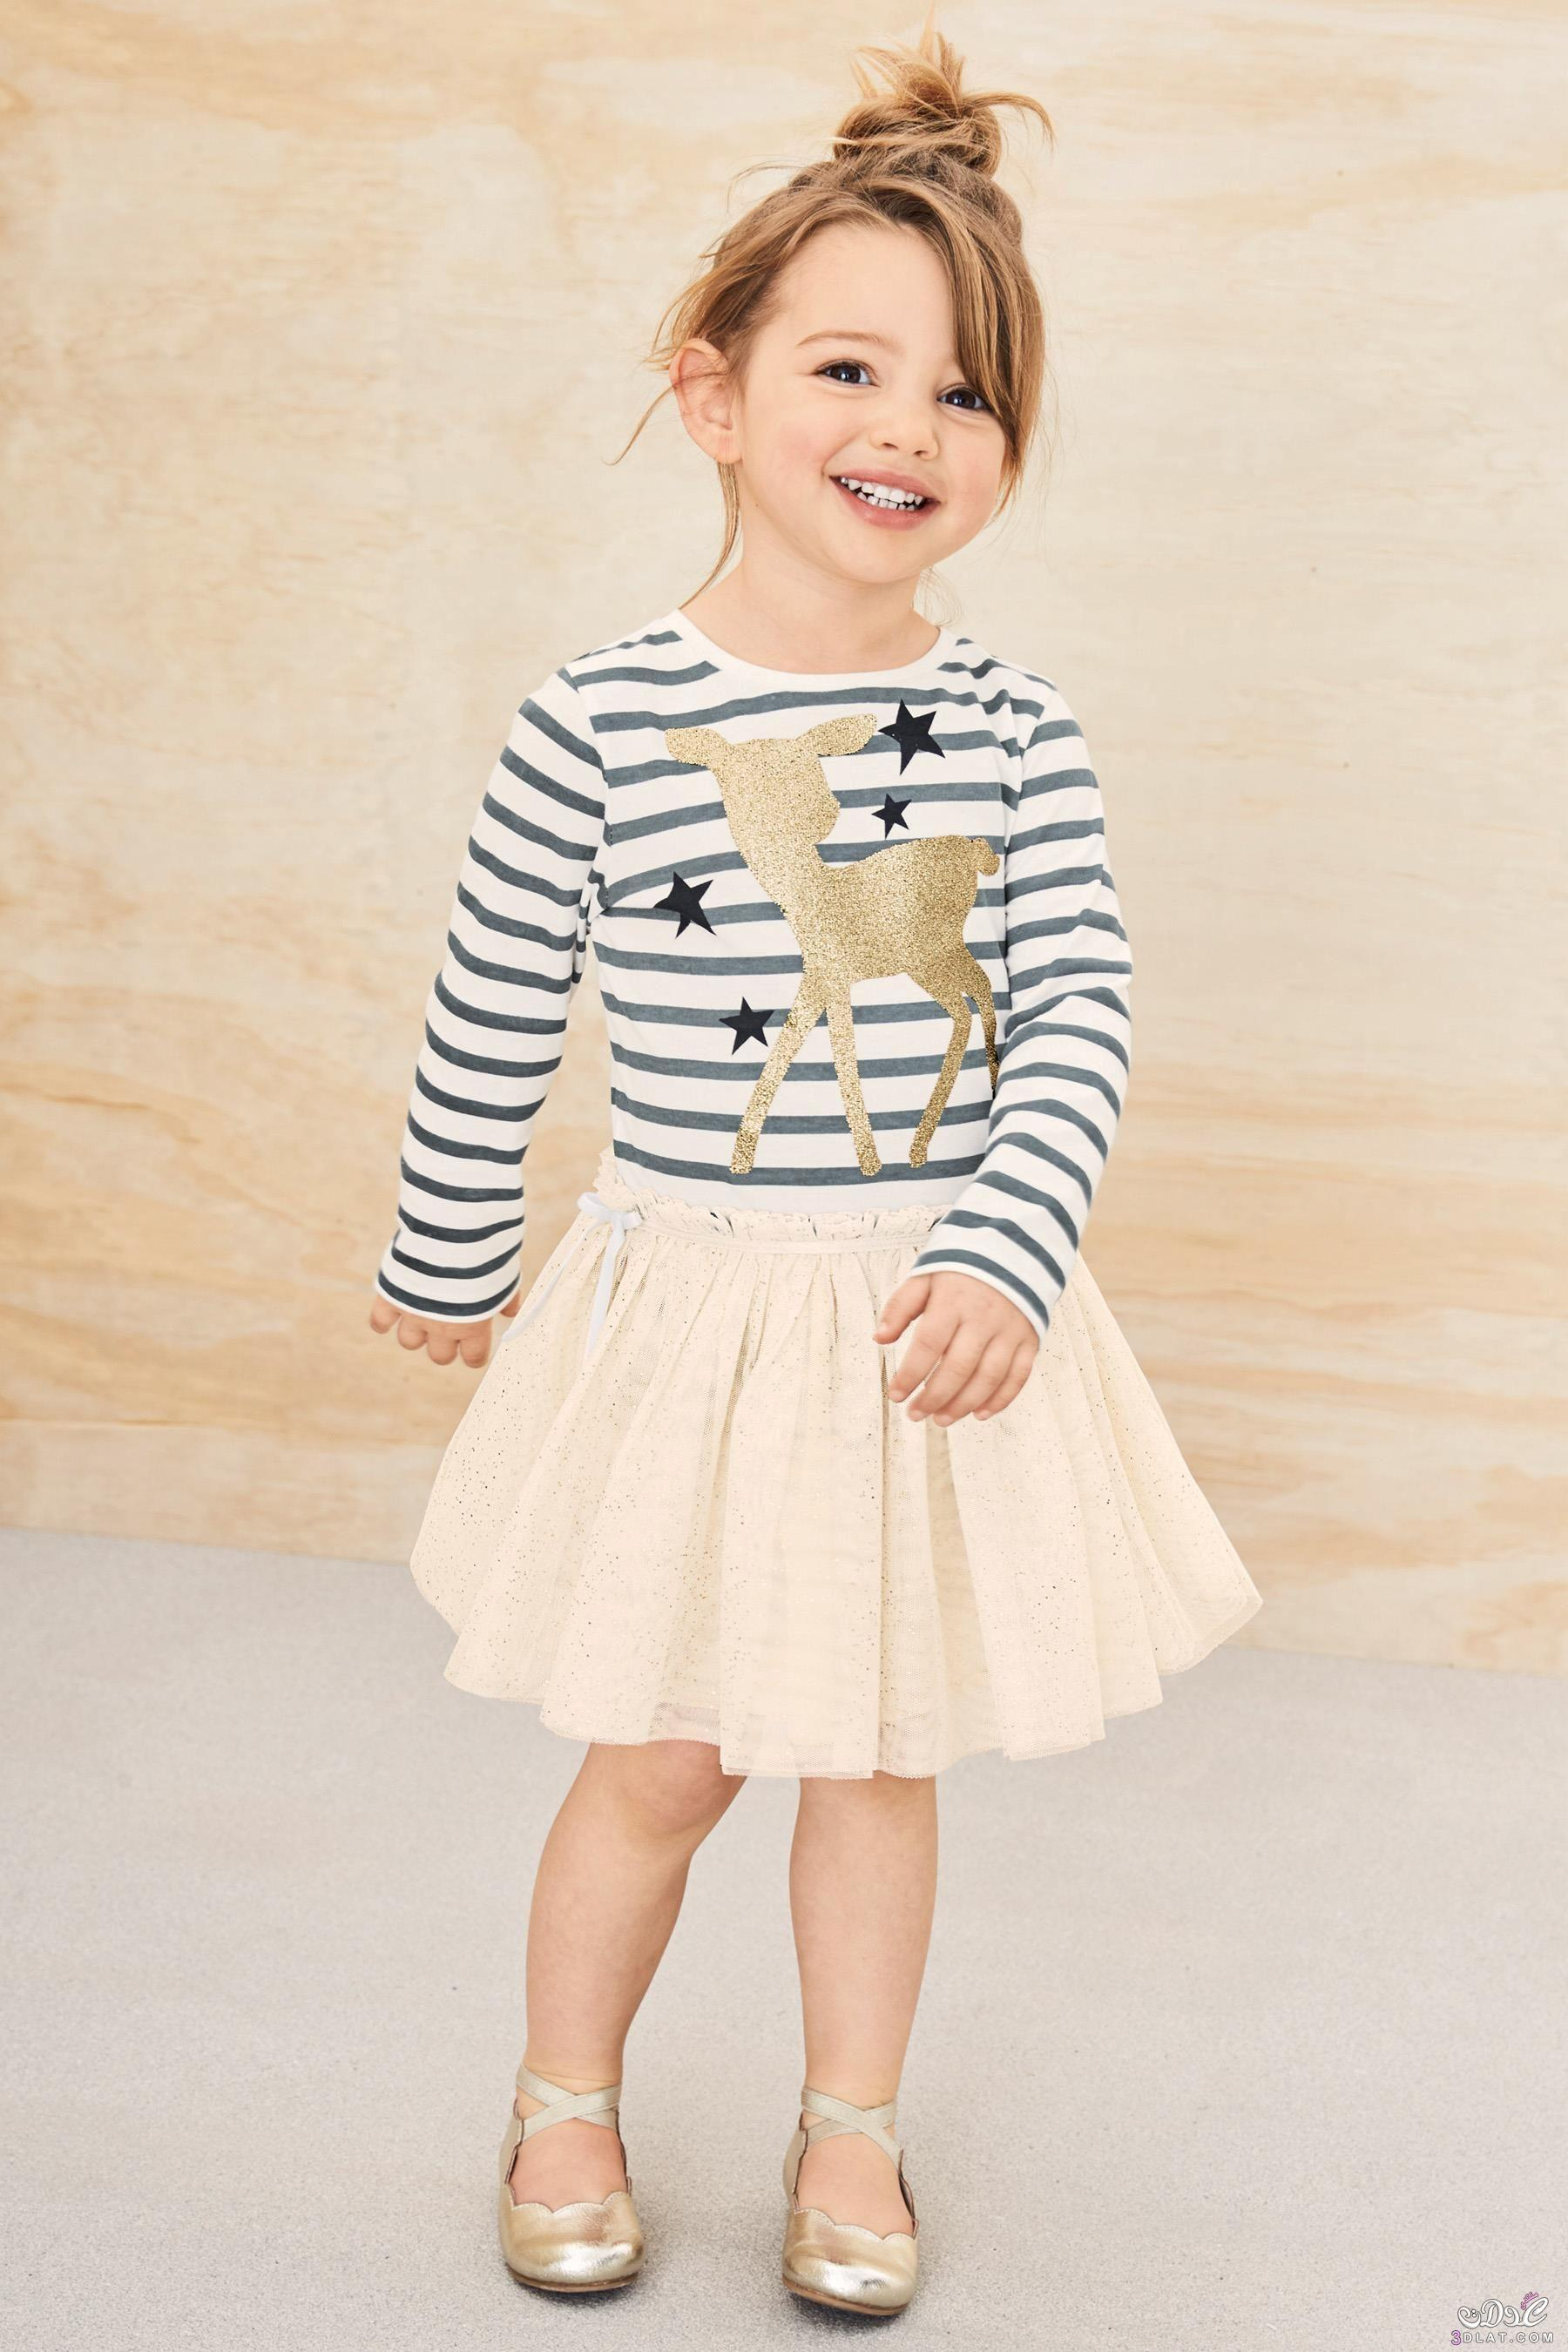 fb237d6b5dd70 ملابس بنوتات لشتاء 2020..اجدد موديلات ملابس الاطفال..ملابس اطفال ...